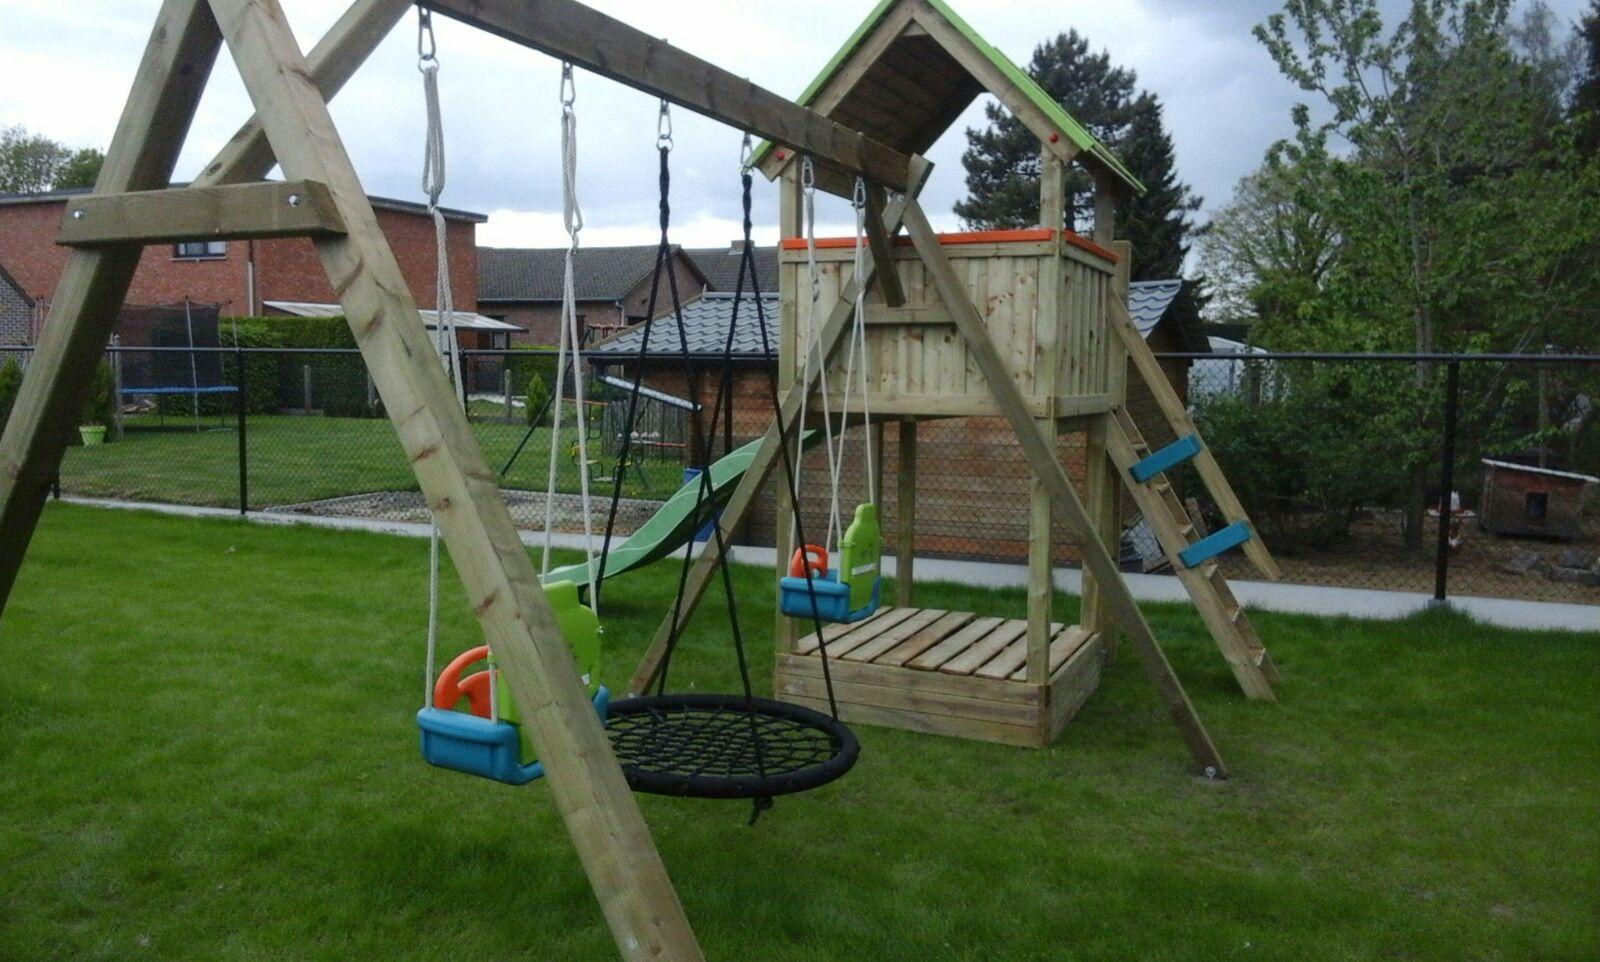 Speeltoestel Kleine Tuin : Speeltoestel in de tuin. hens constructs